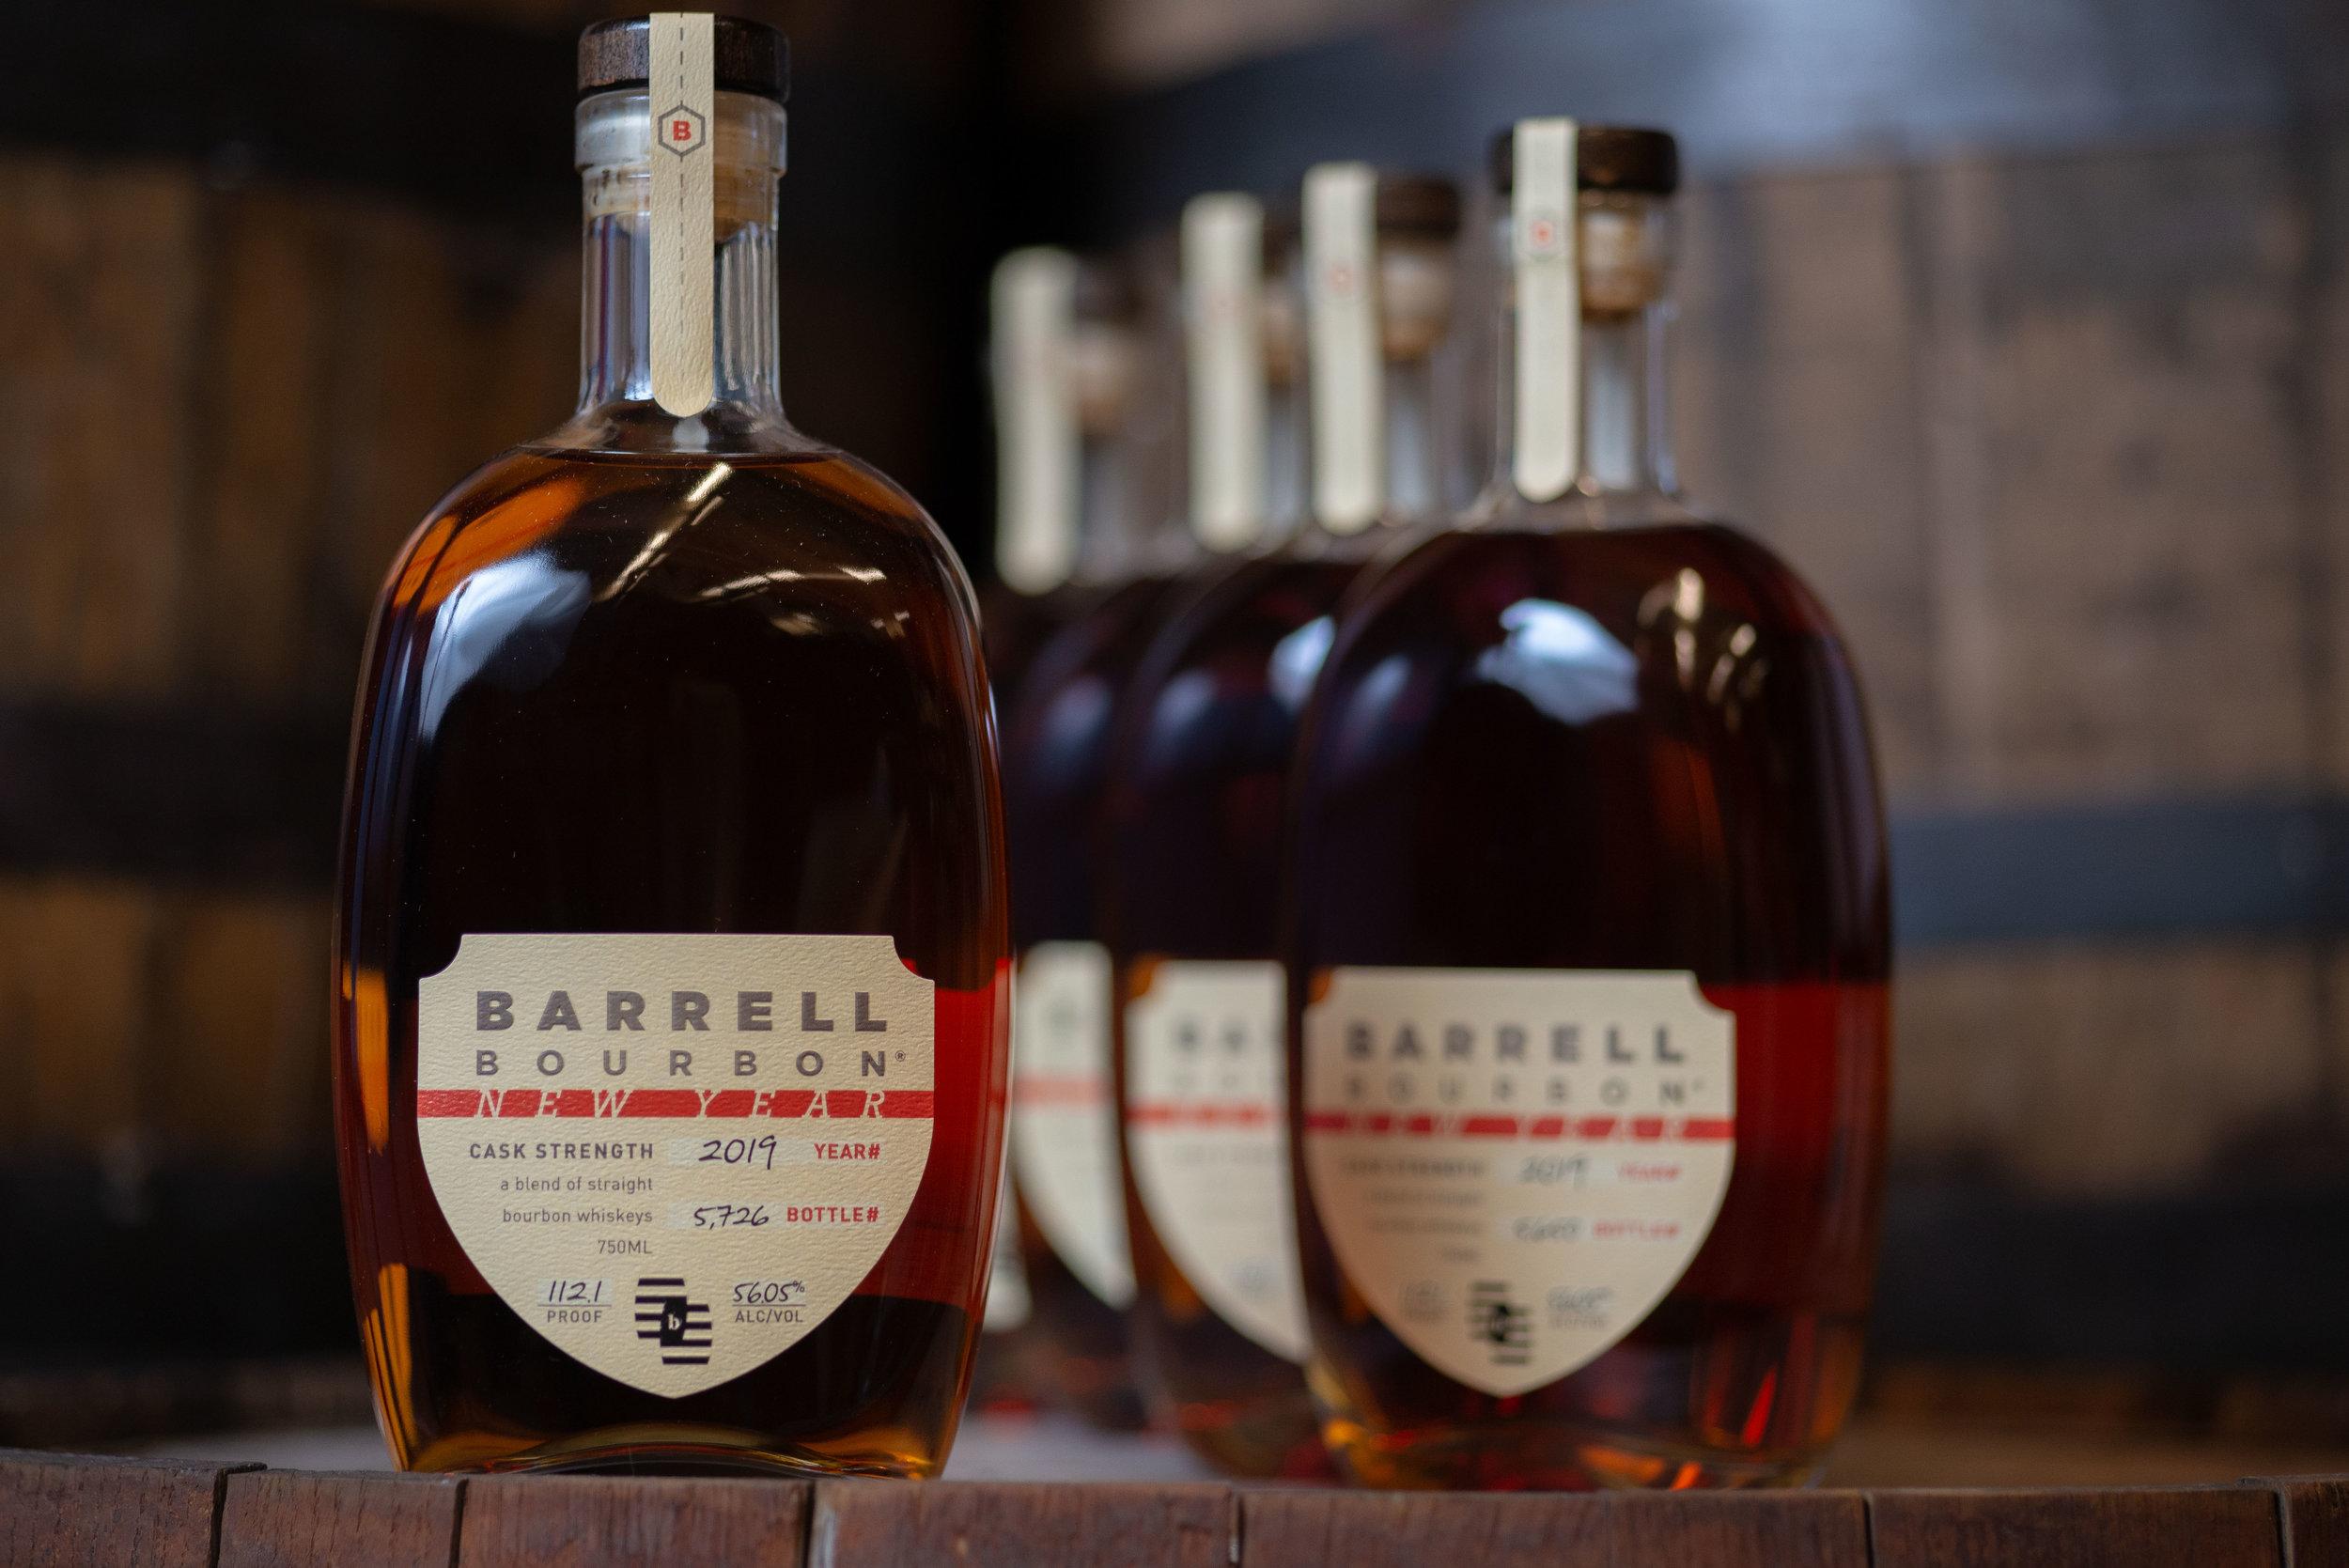 barrell-new-year.jpg